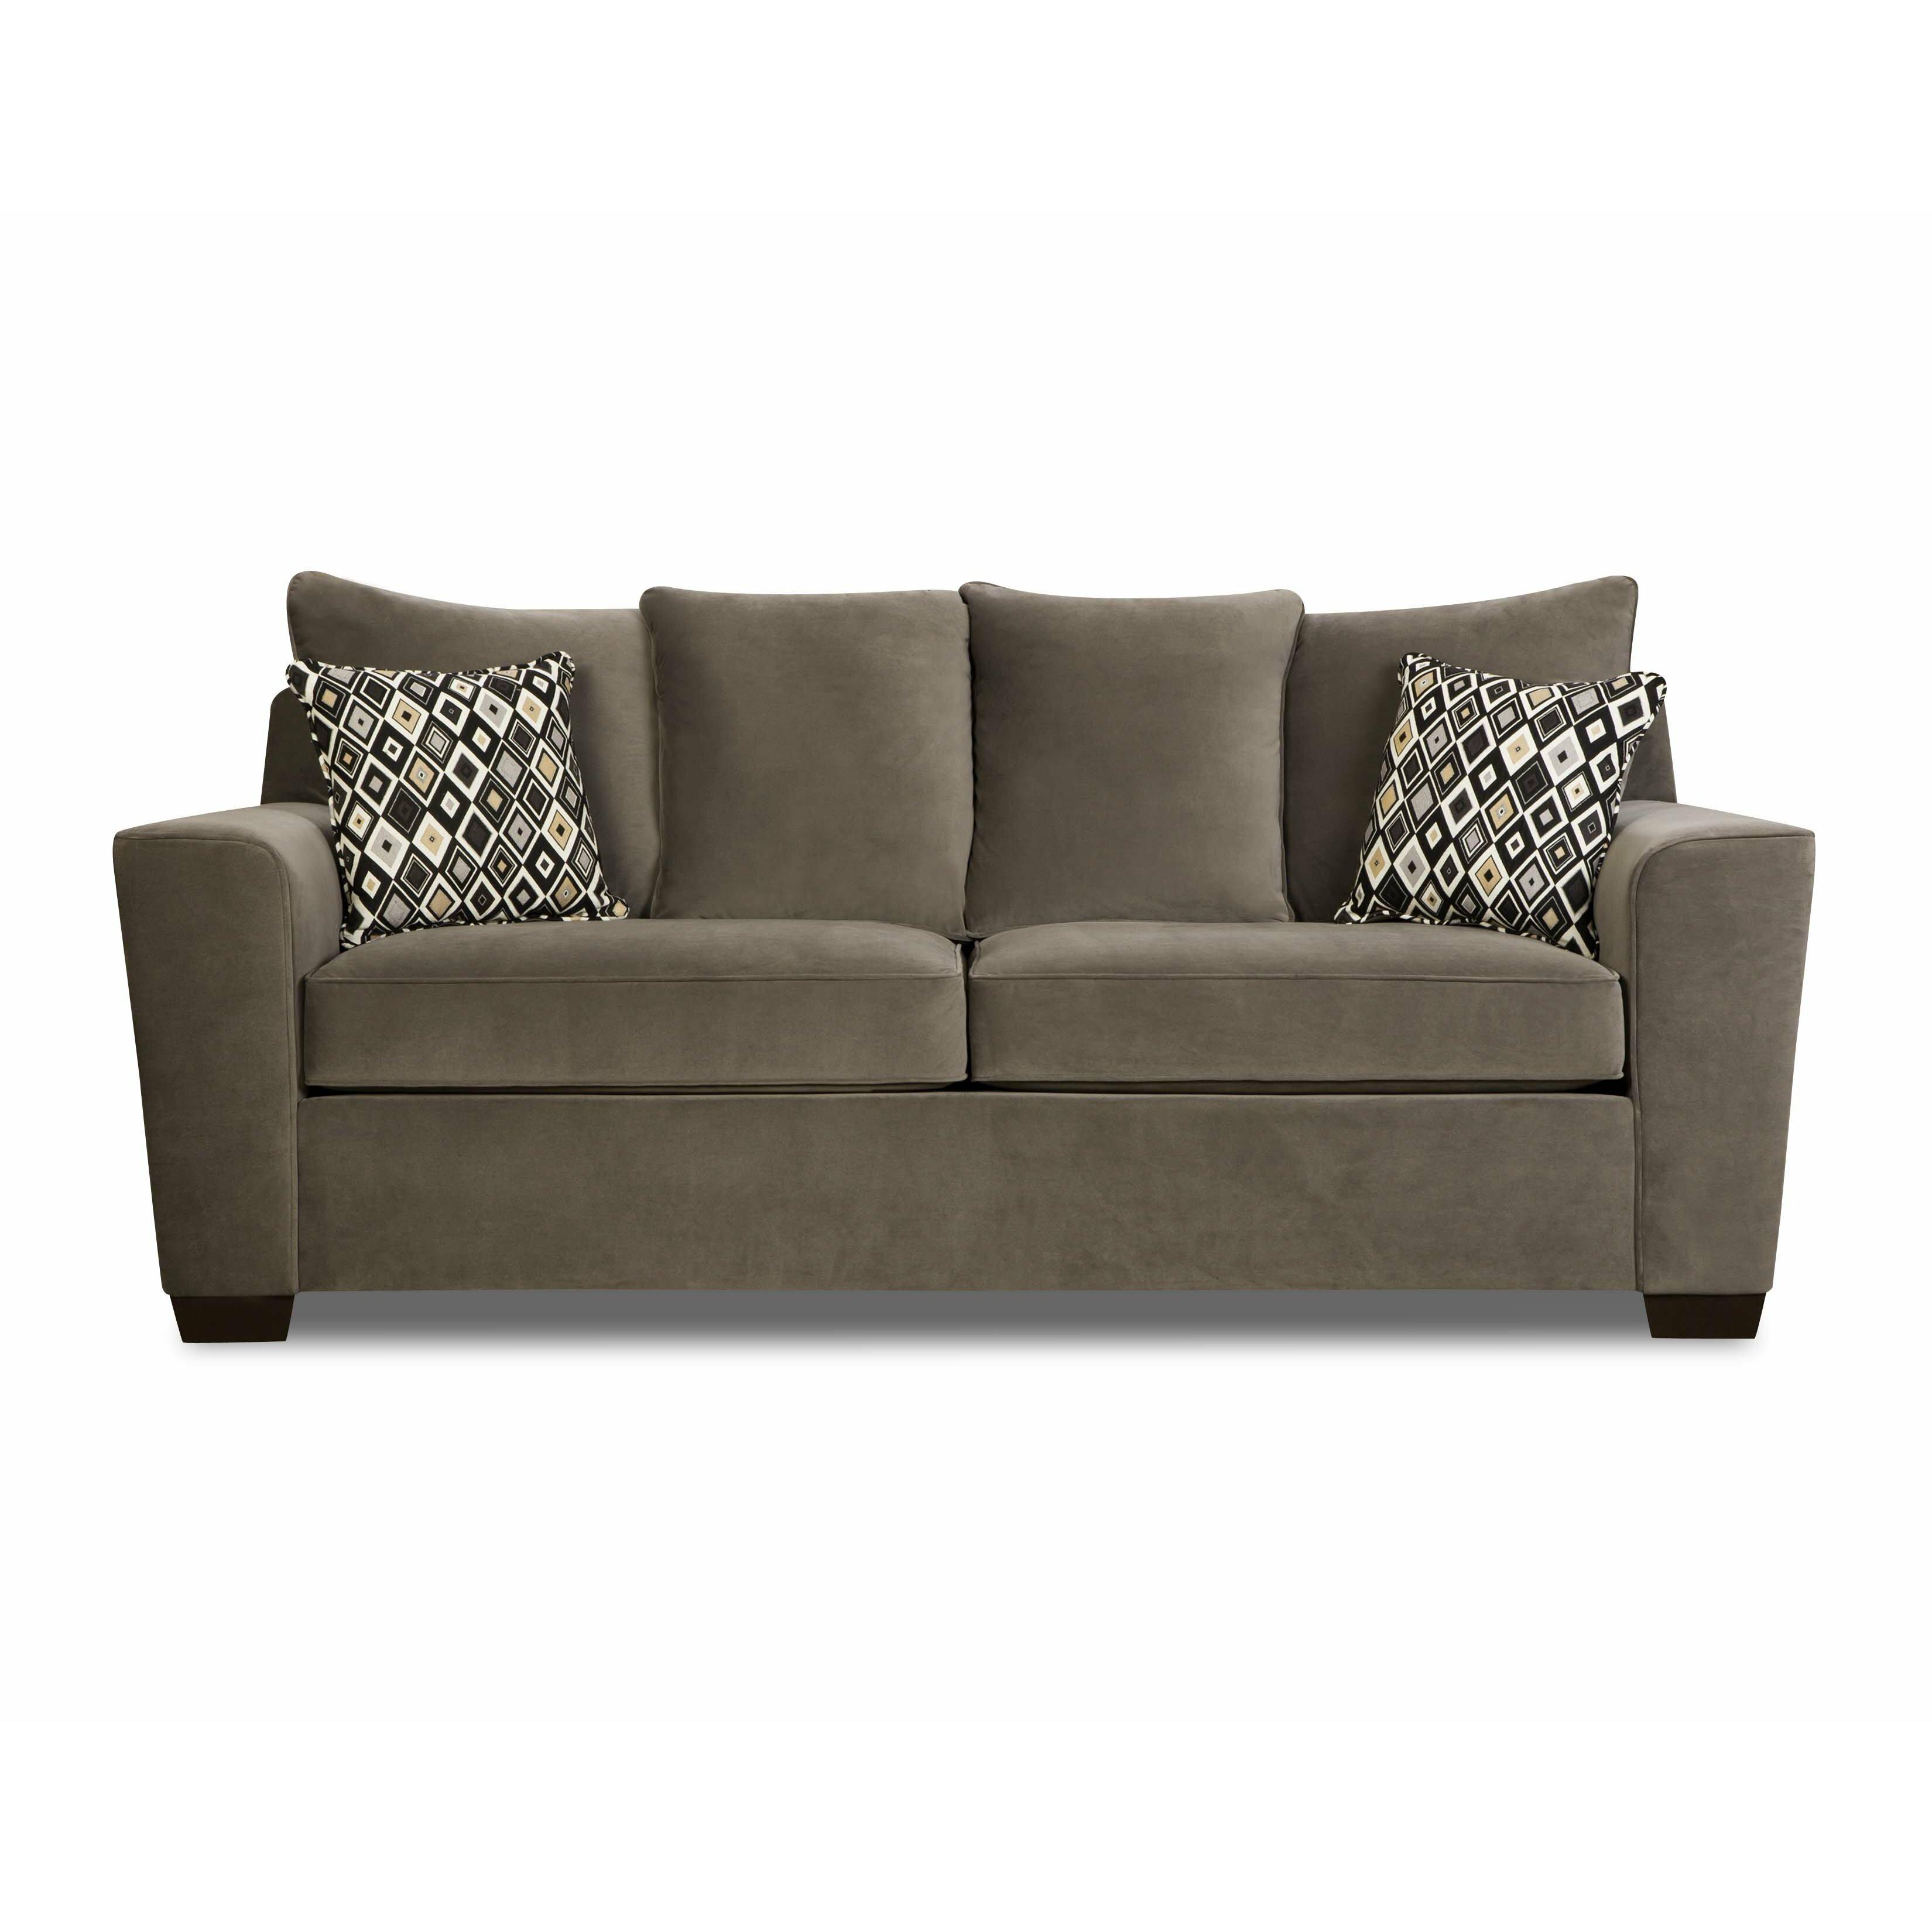 Simmons Upholstery Roxanne Queen Sleeper Sofa Reviews